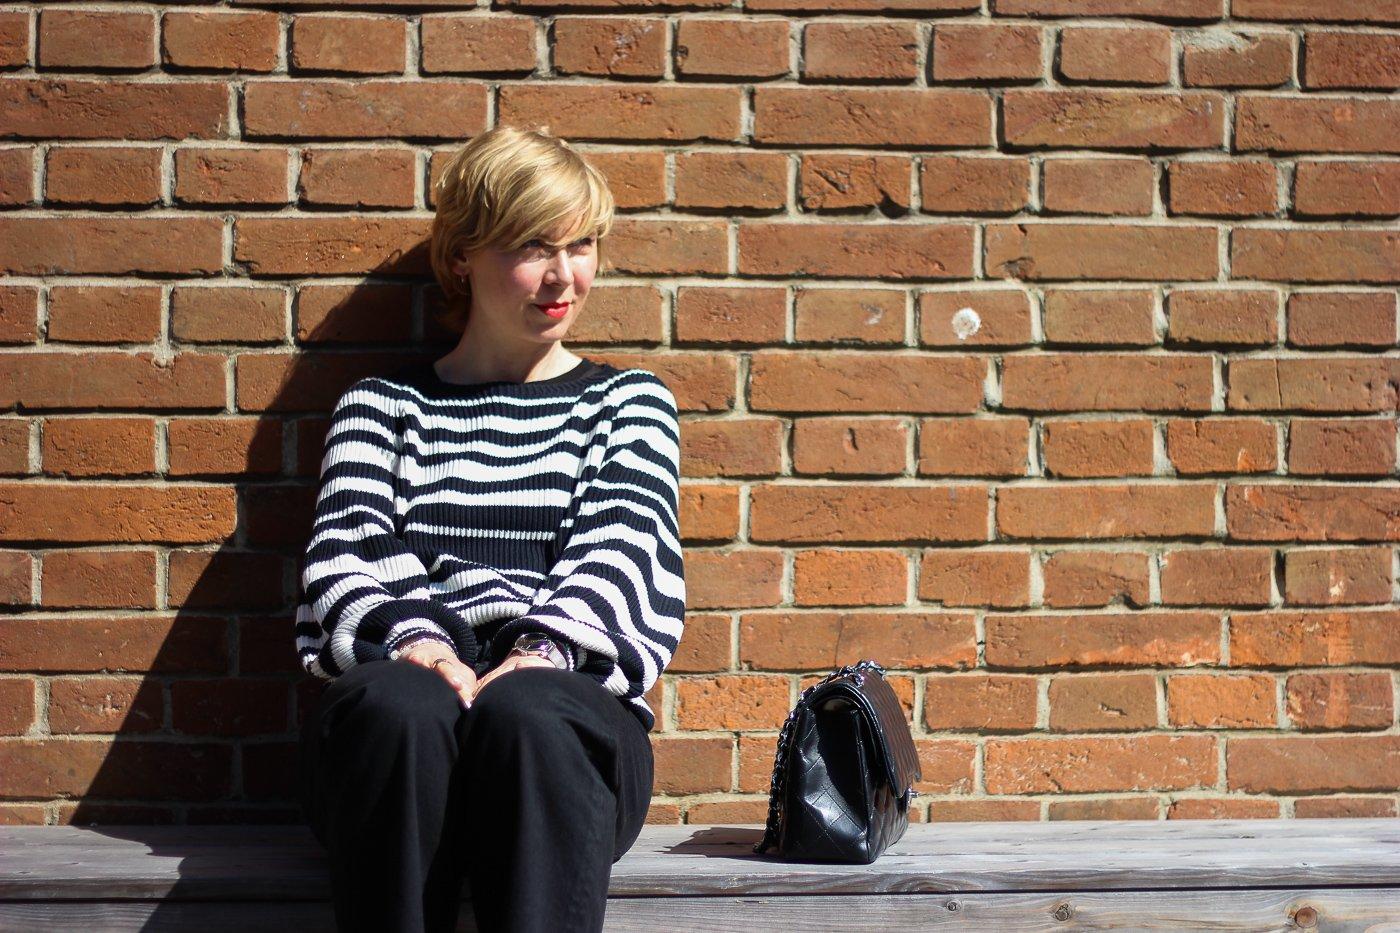 conny doll lifestyle: Platz an der Sonne sitzen, Frühlingslook, Streifenpullover